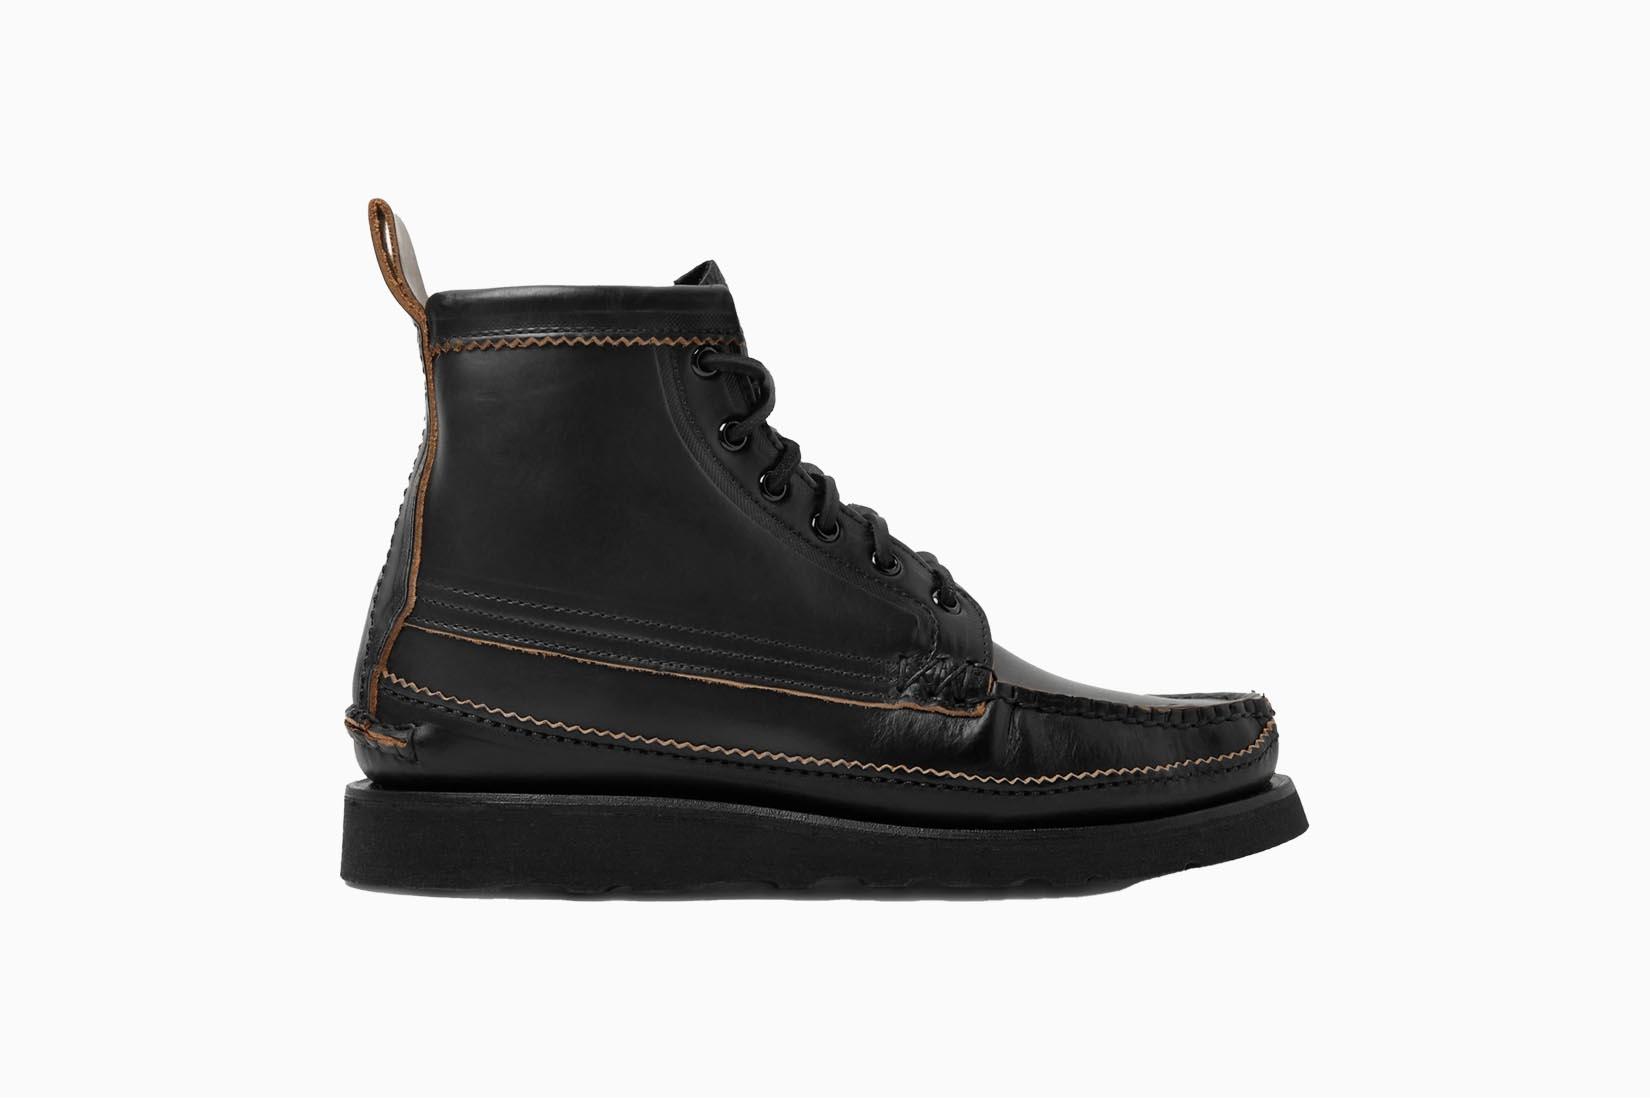 best boots men yuketen review Luxe Digital